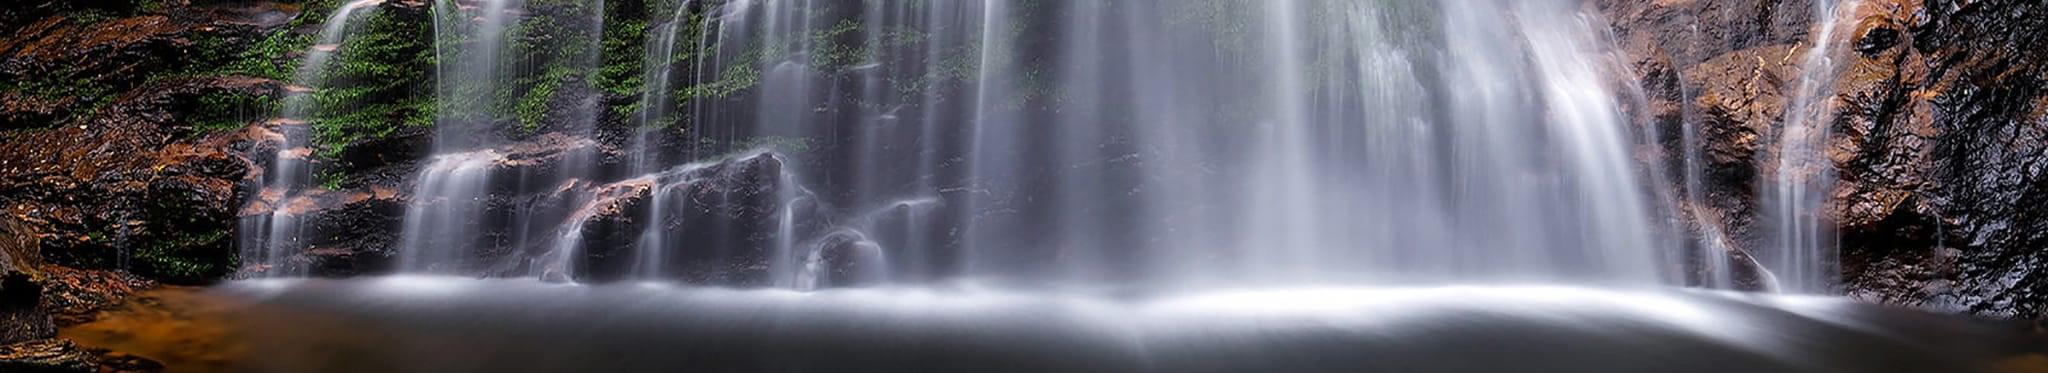 Духи природы:<br>Ханой, Лао Кай, Сапа, Кат Кат, Таван, Су Пан, Ханой